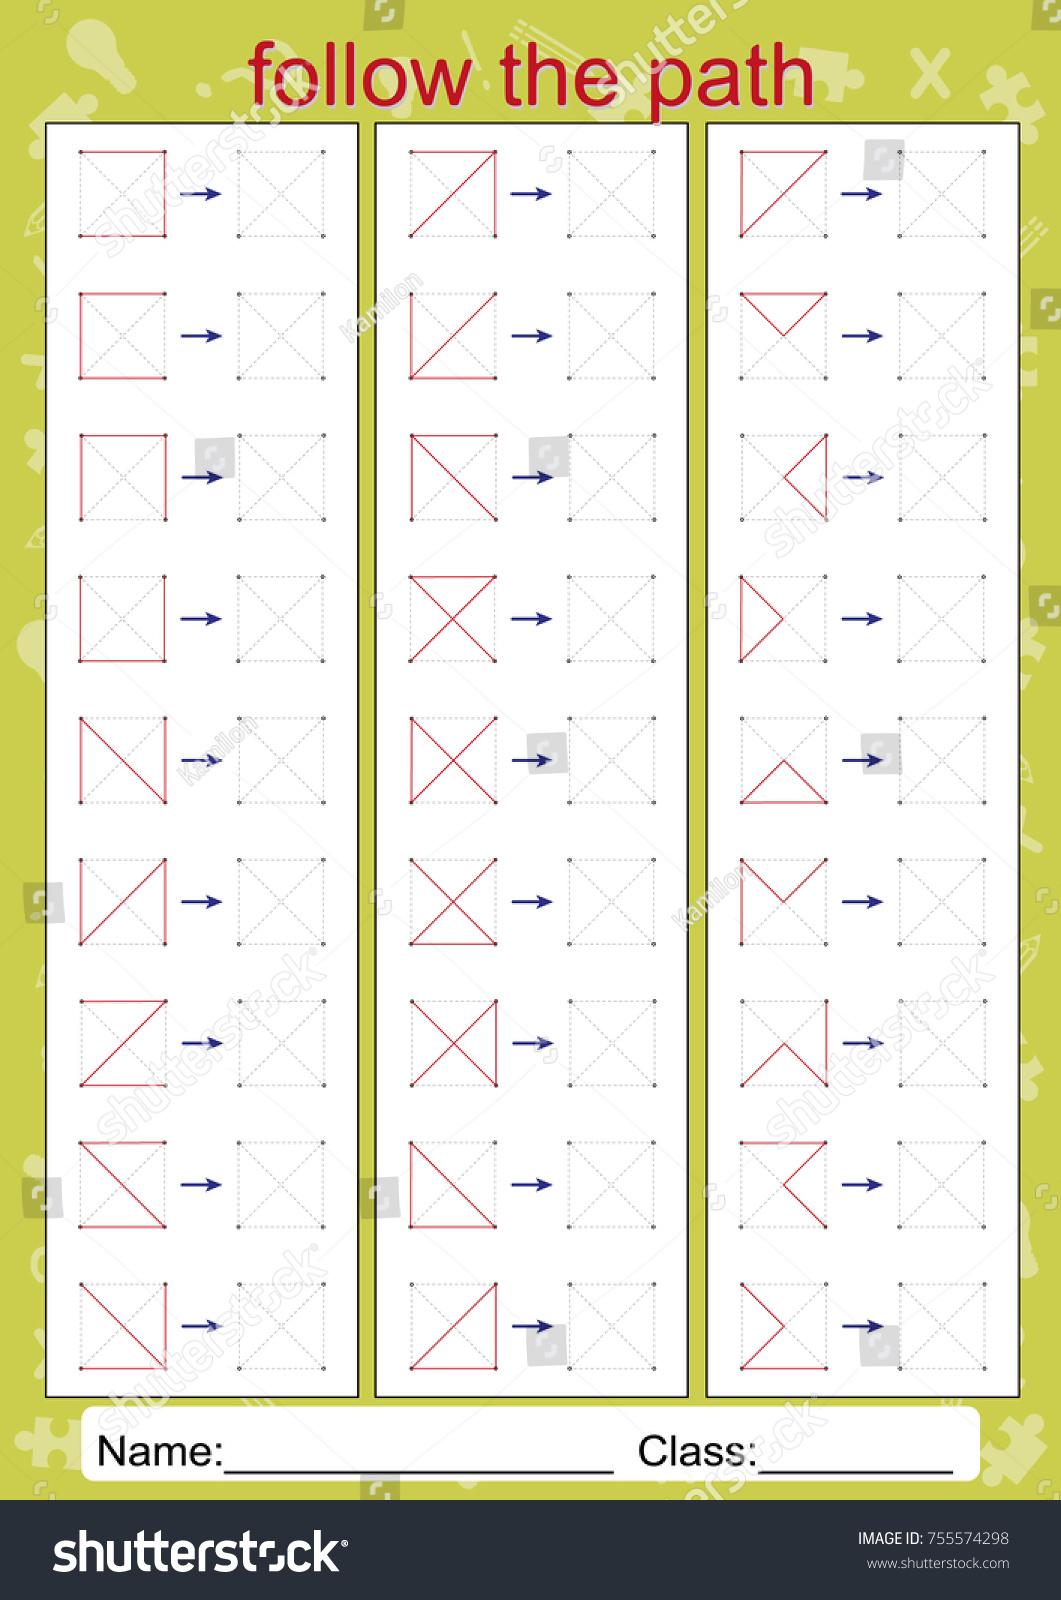 worksheet Visual Perception Worksheets visual perceptual worksheets motor perception stock vector hd homework